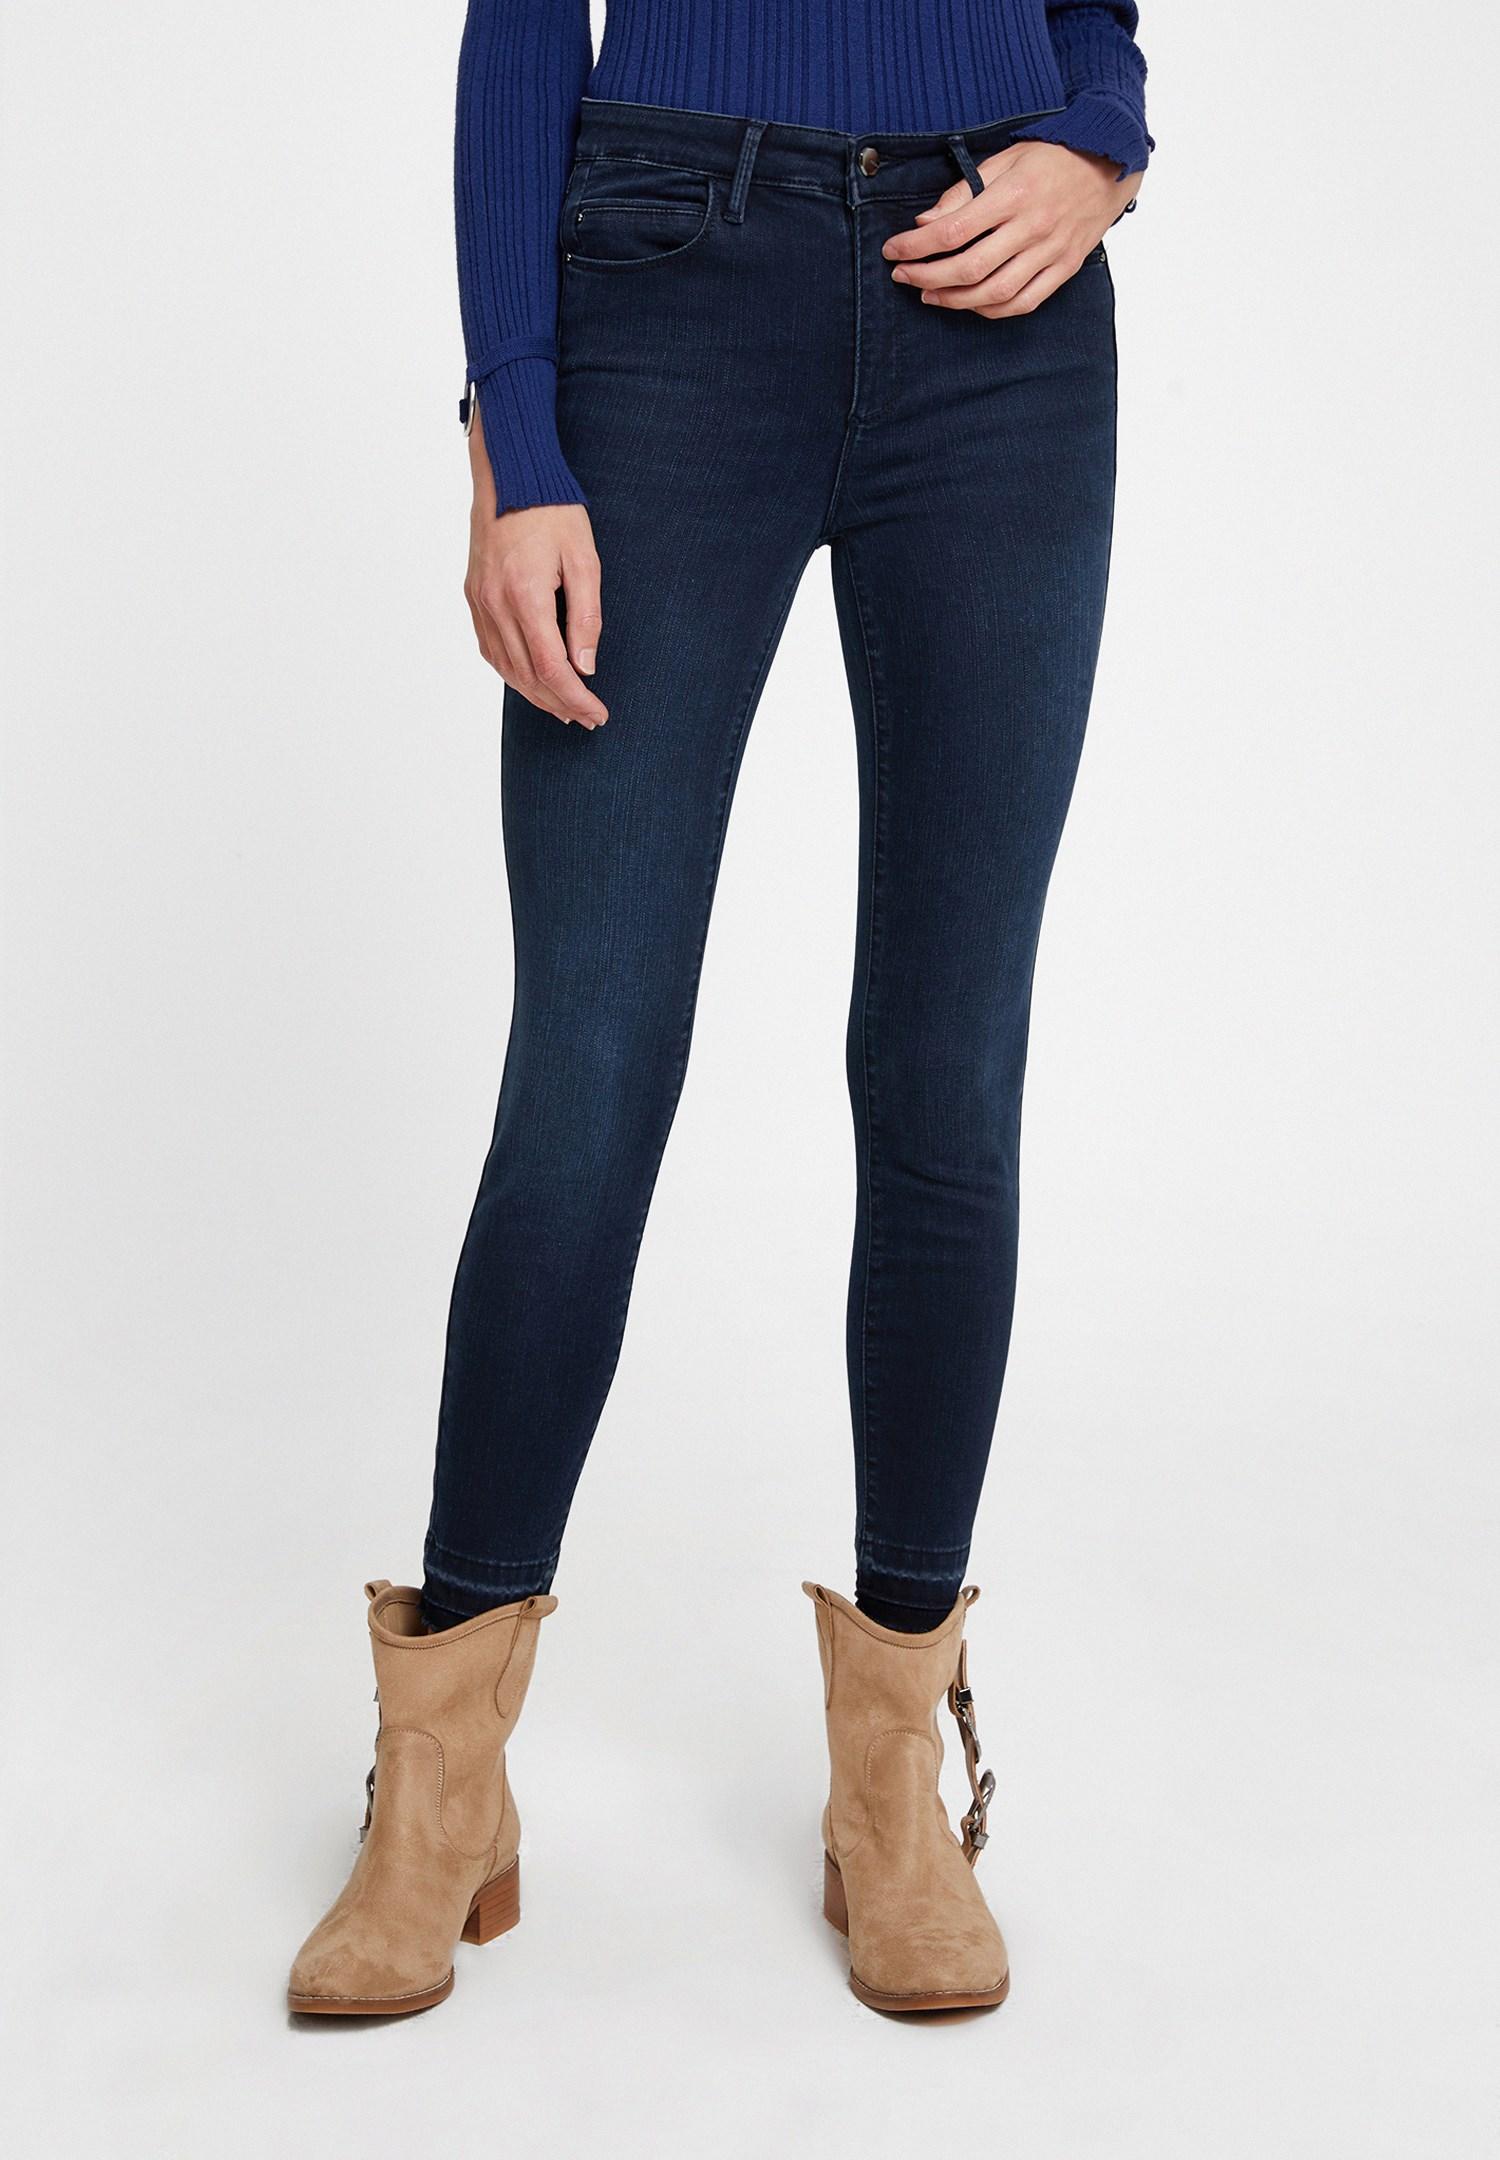 Bayan Lacivert Orta Bel Paça Detaylı Skinny Pantolon